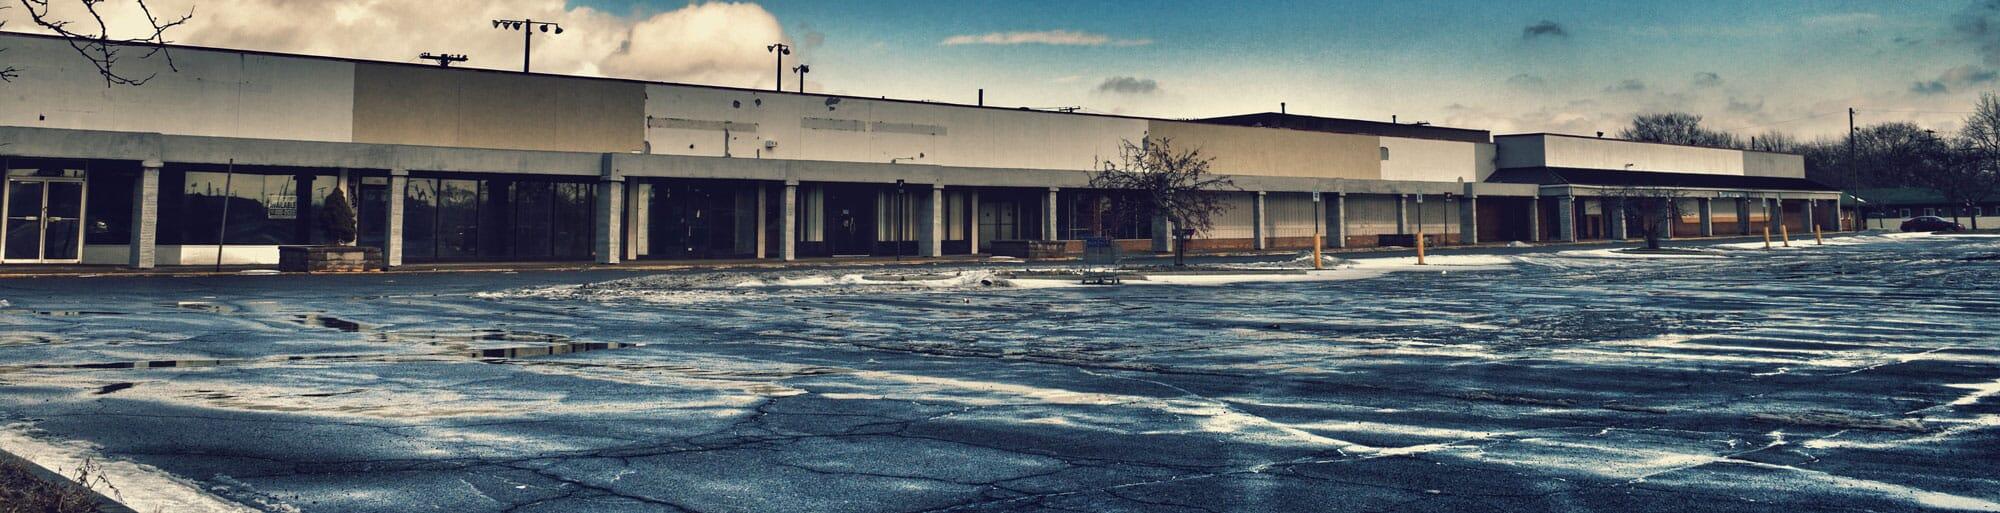 Retail Tsunami: Surviving the Aftermath